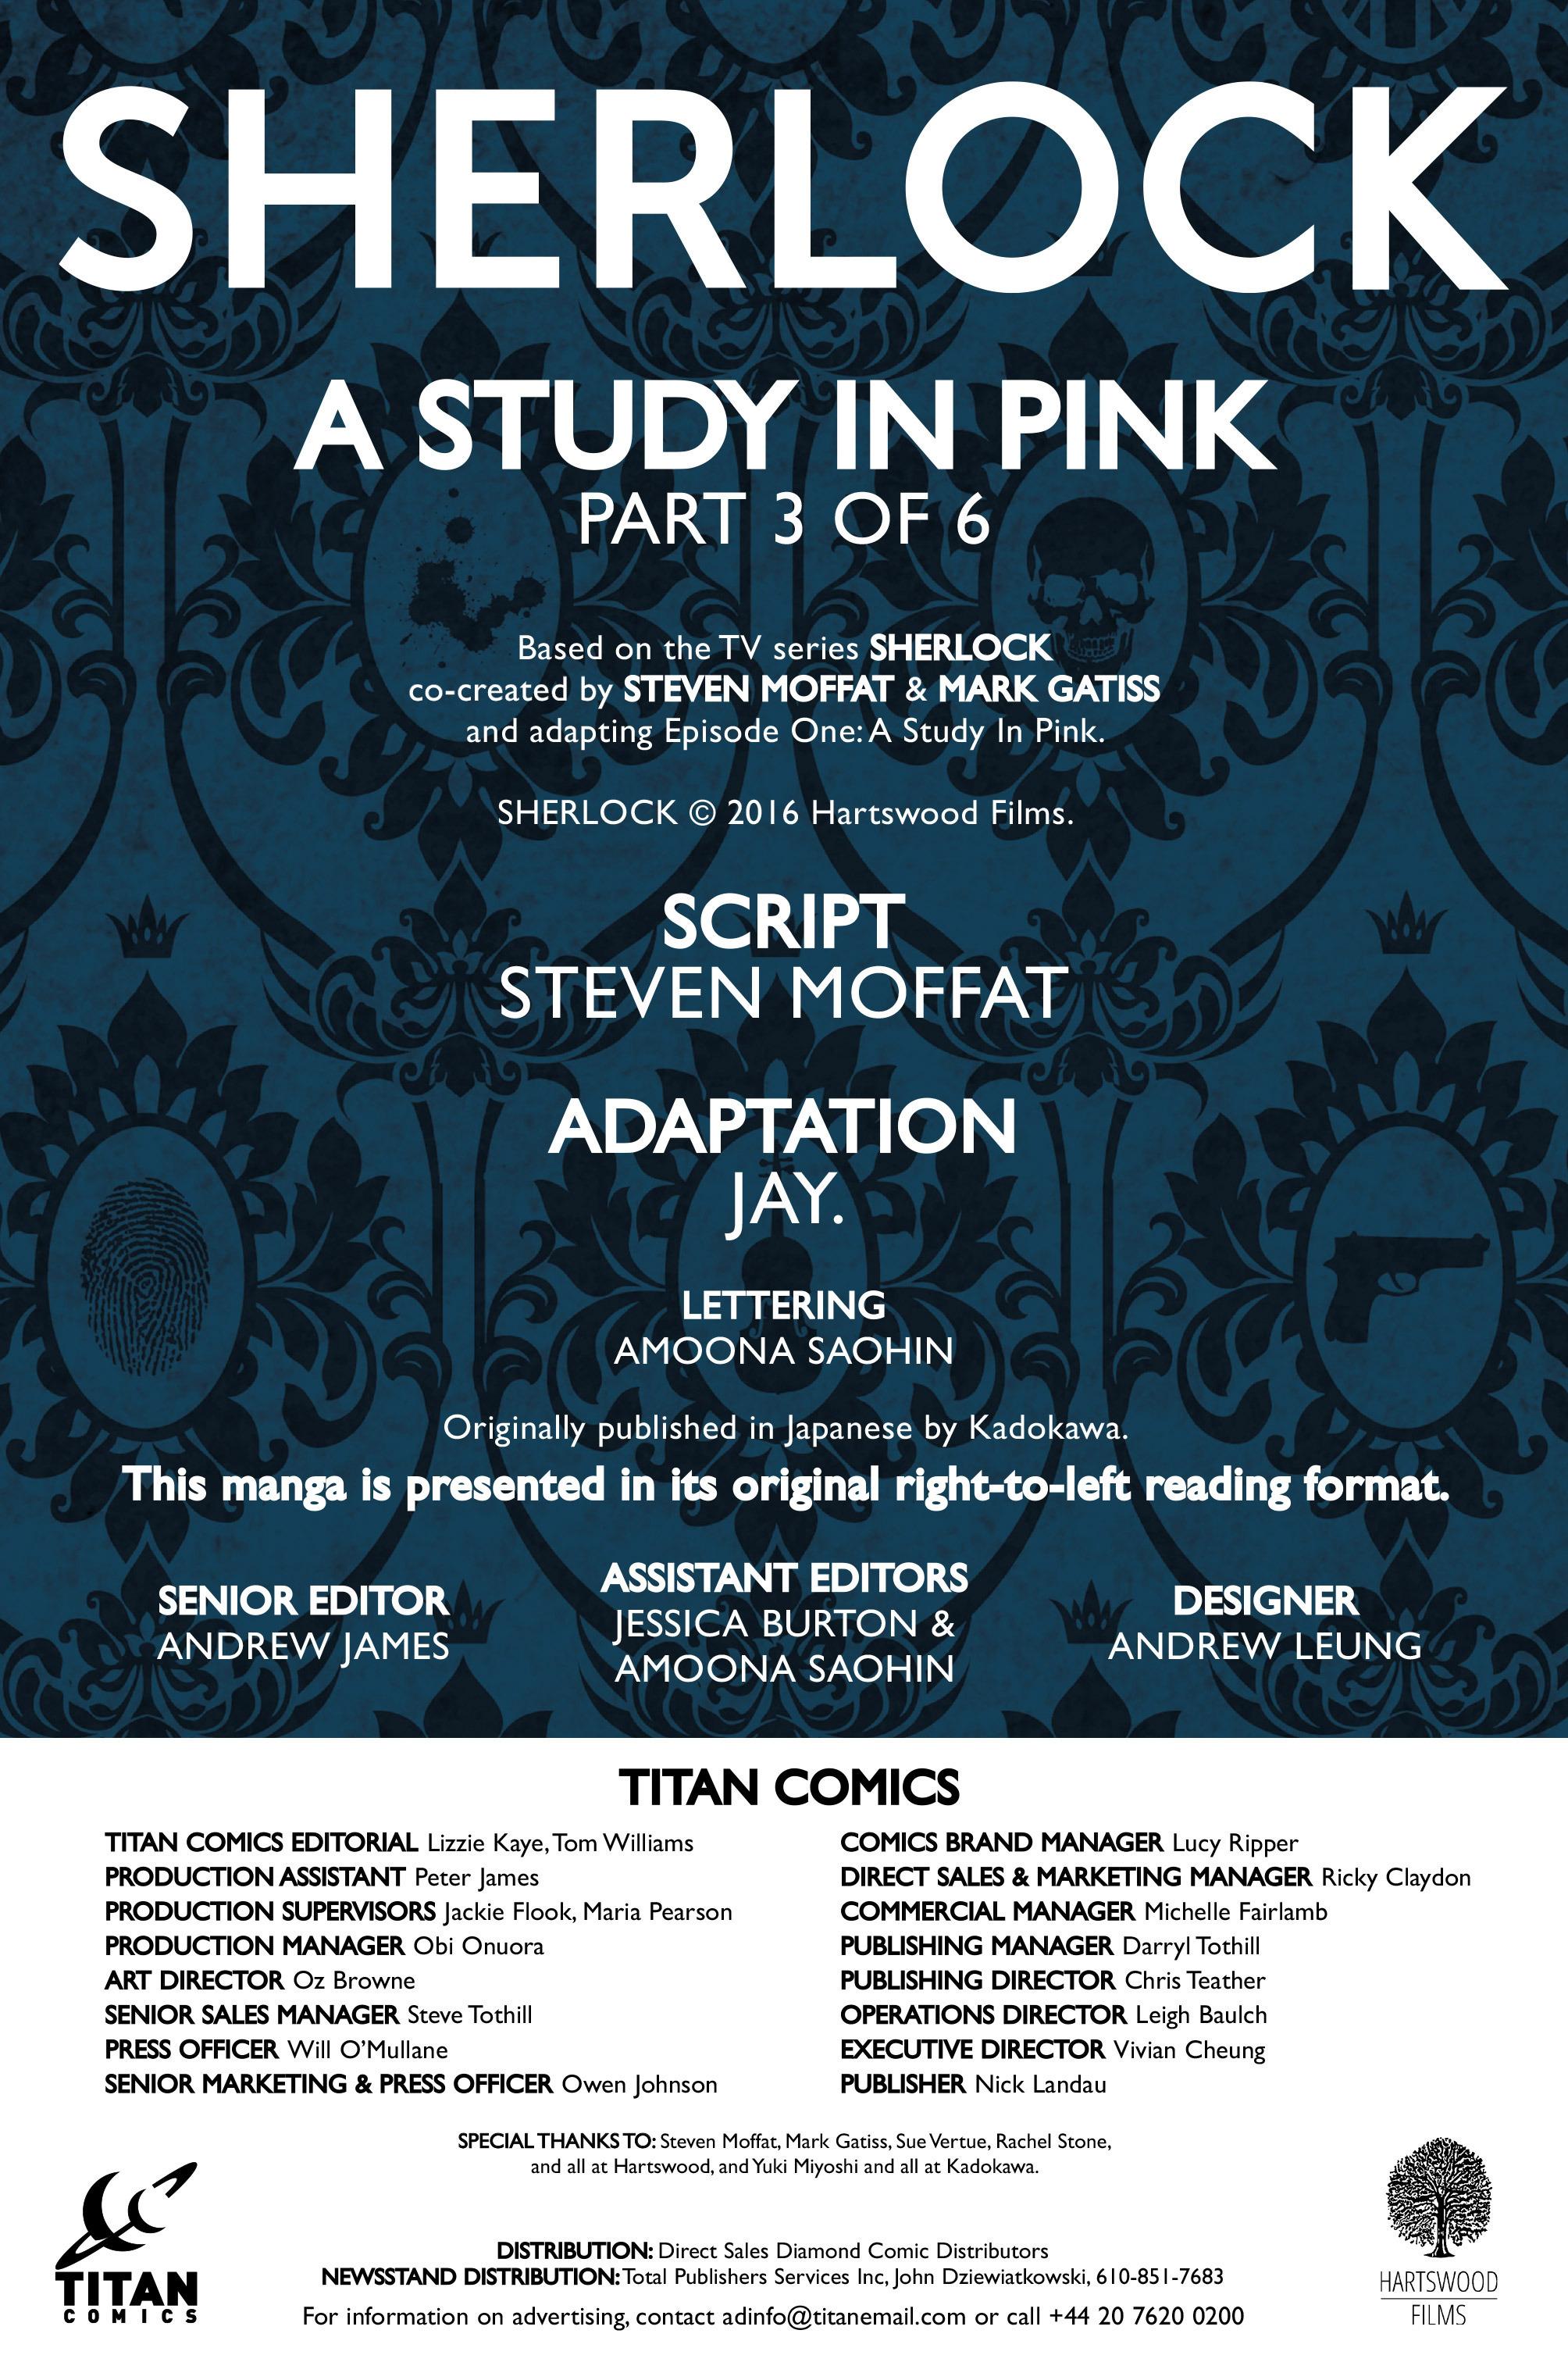 Read online Sherlock: A Study In Pink comic -  Issue #3 - 5